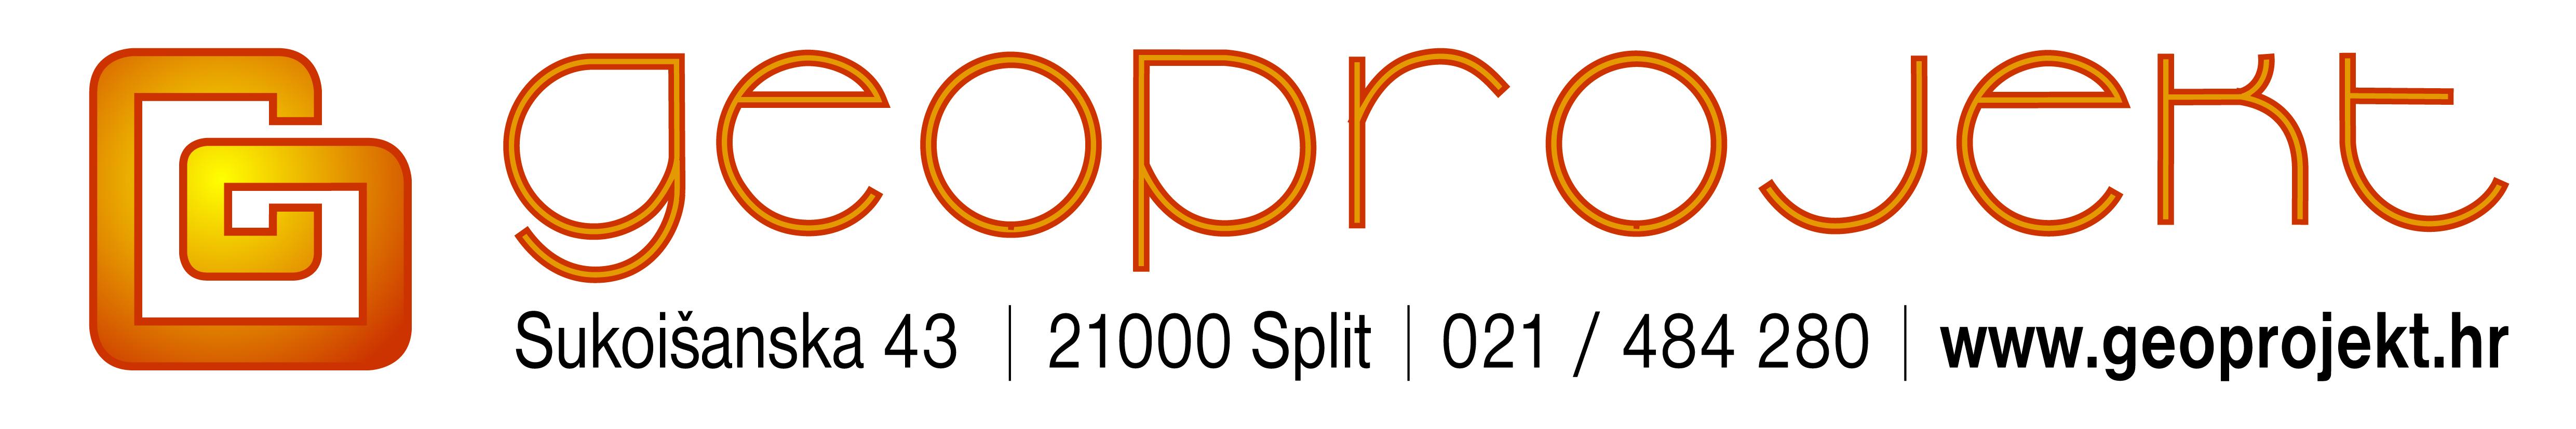 Geoprojekt logo+adresa